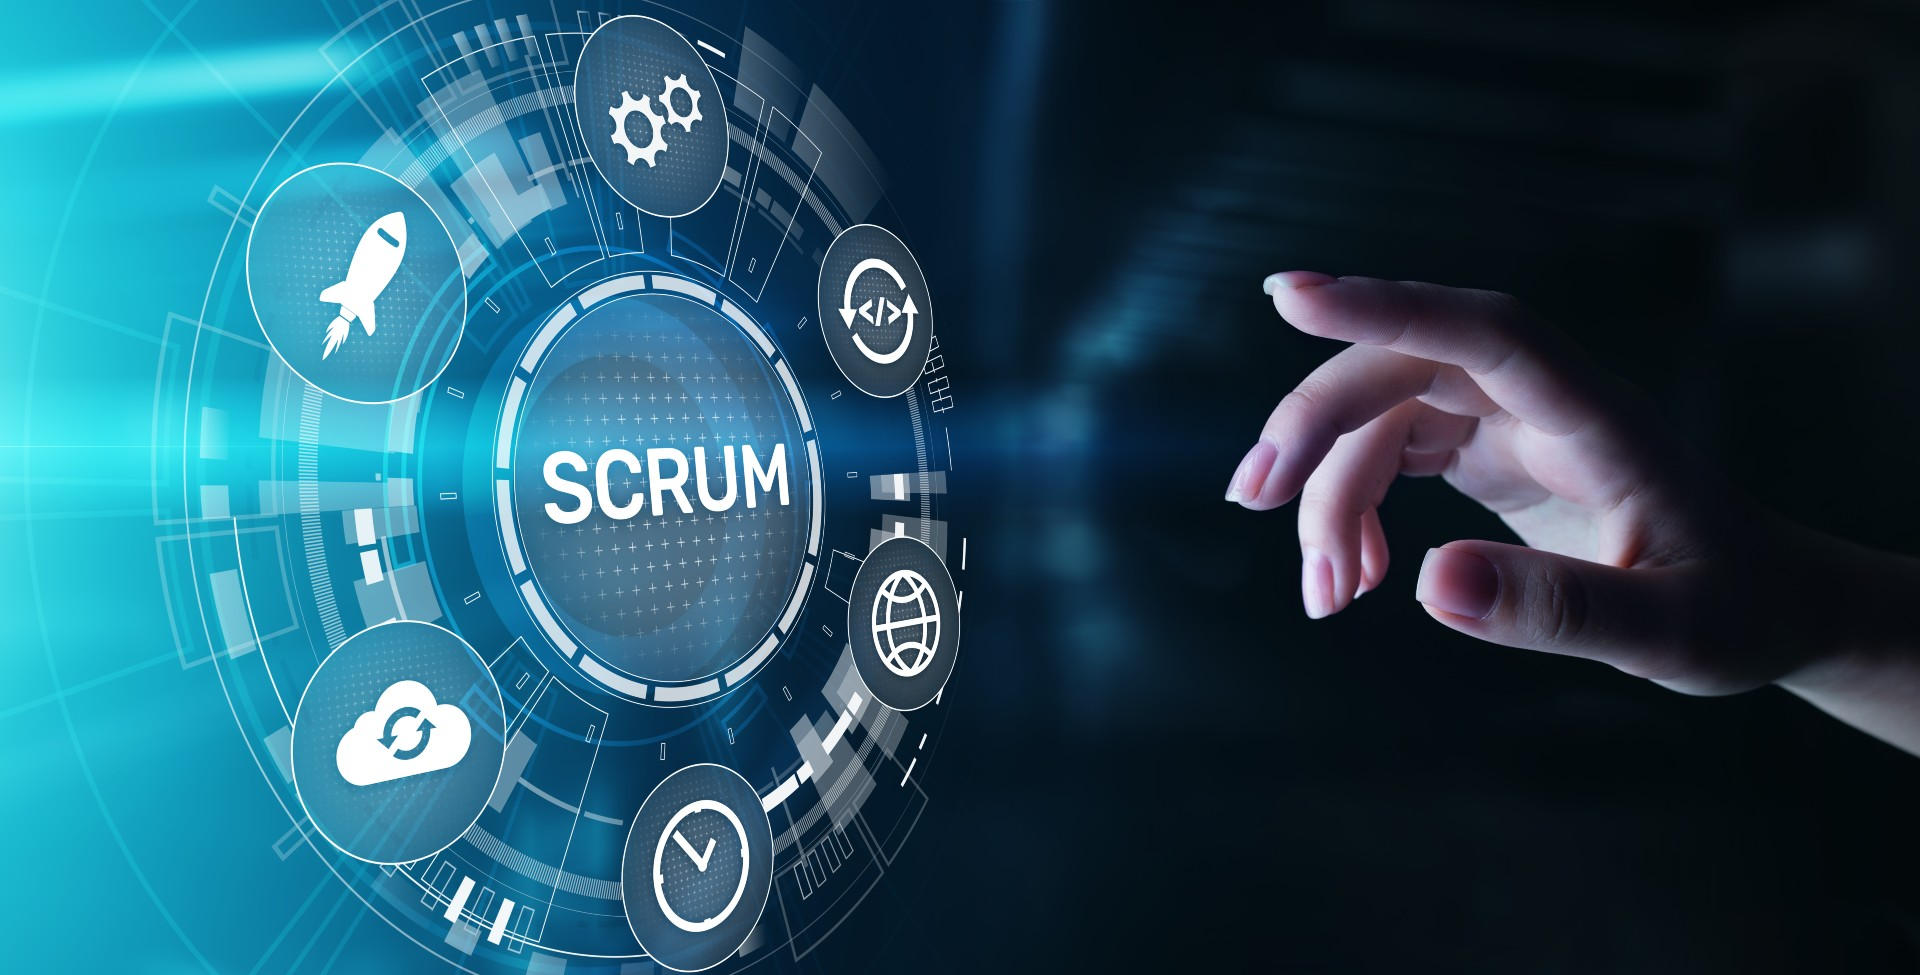 Scrum Framework Activities